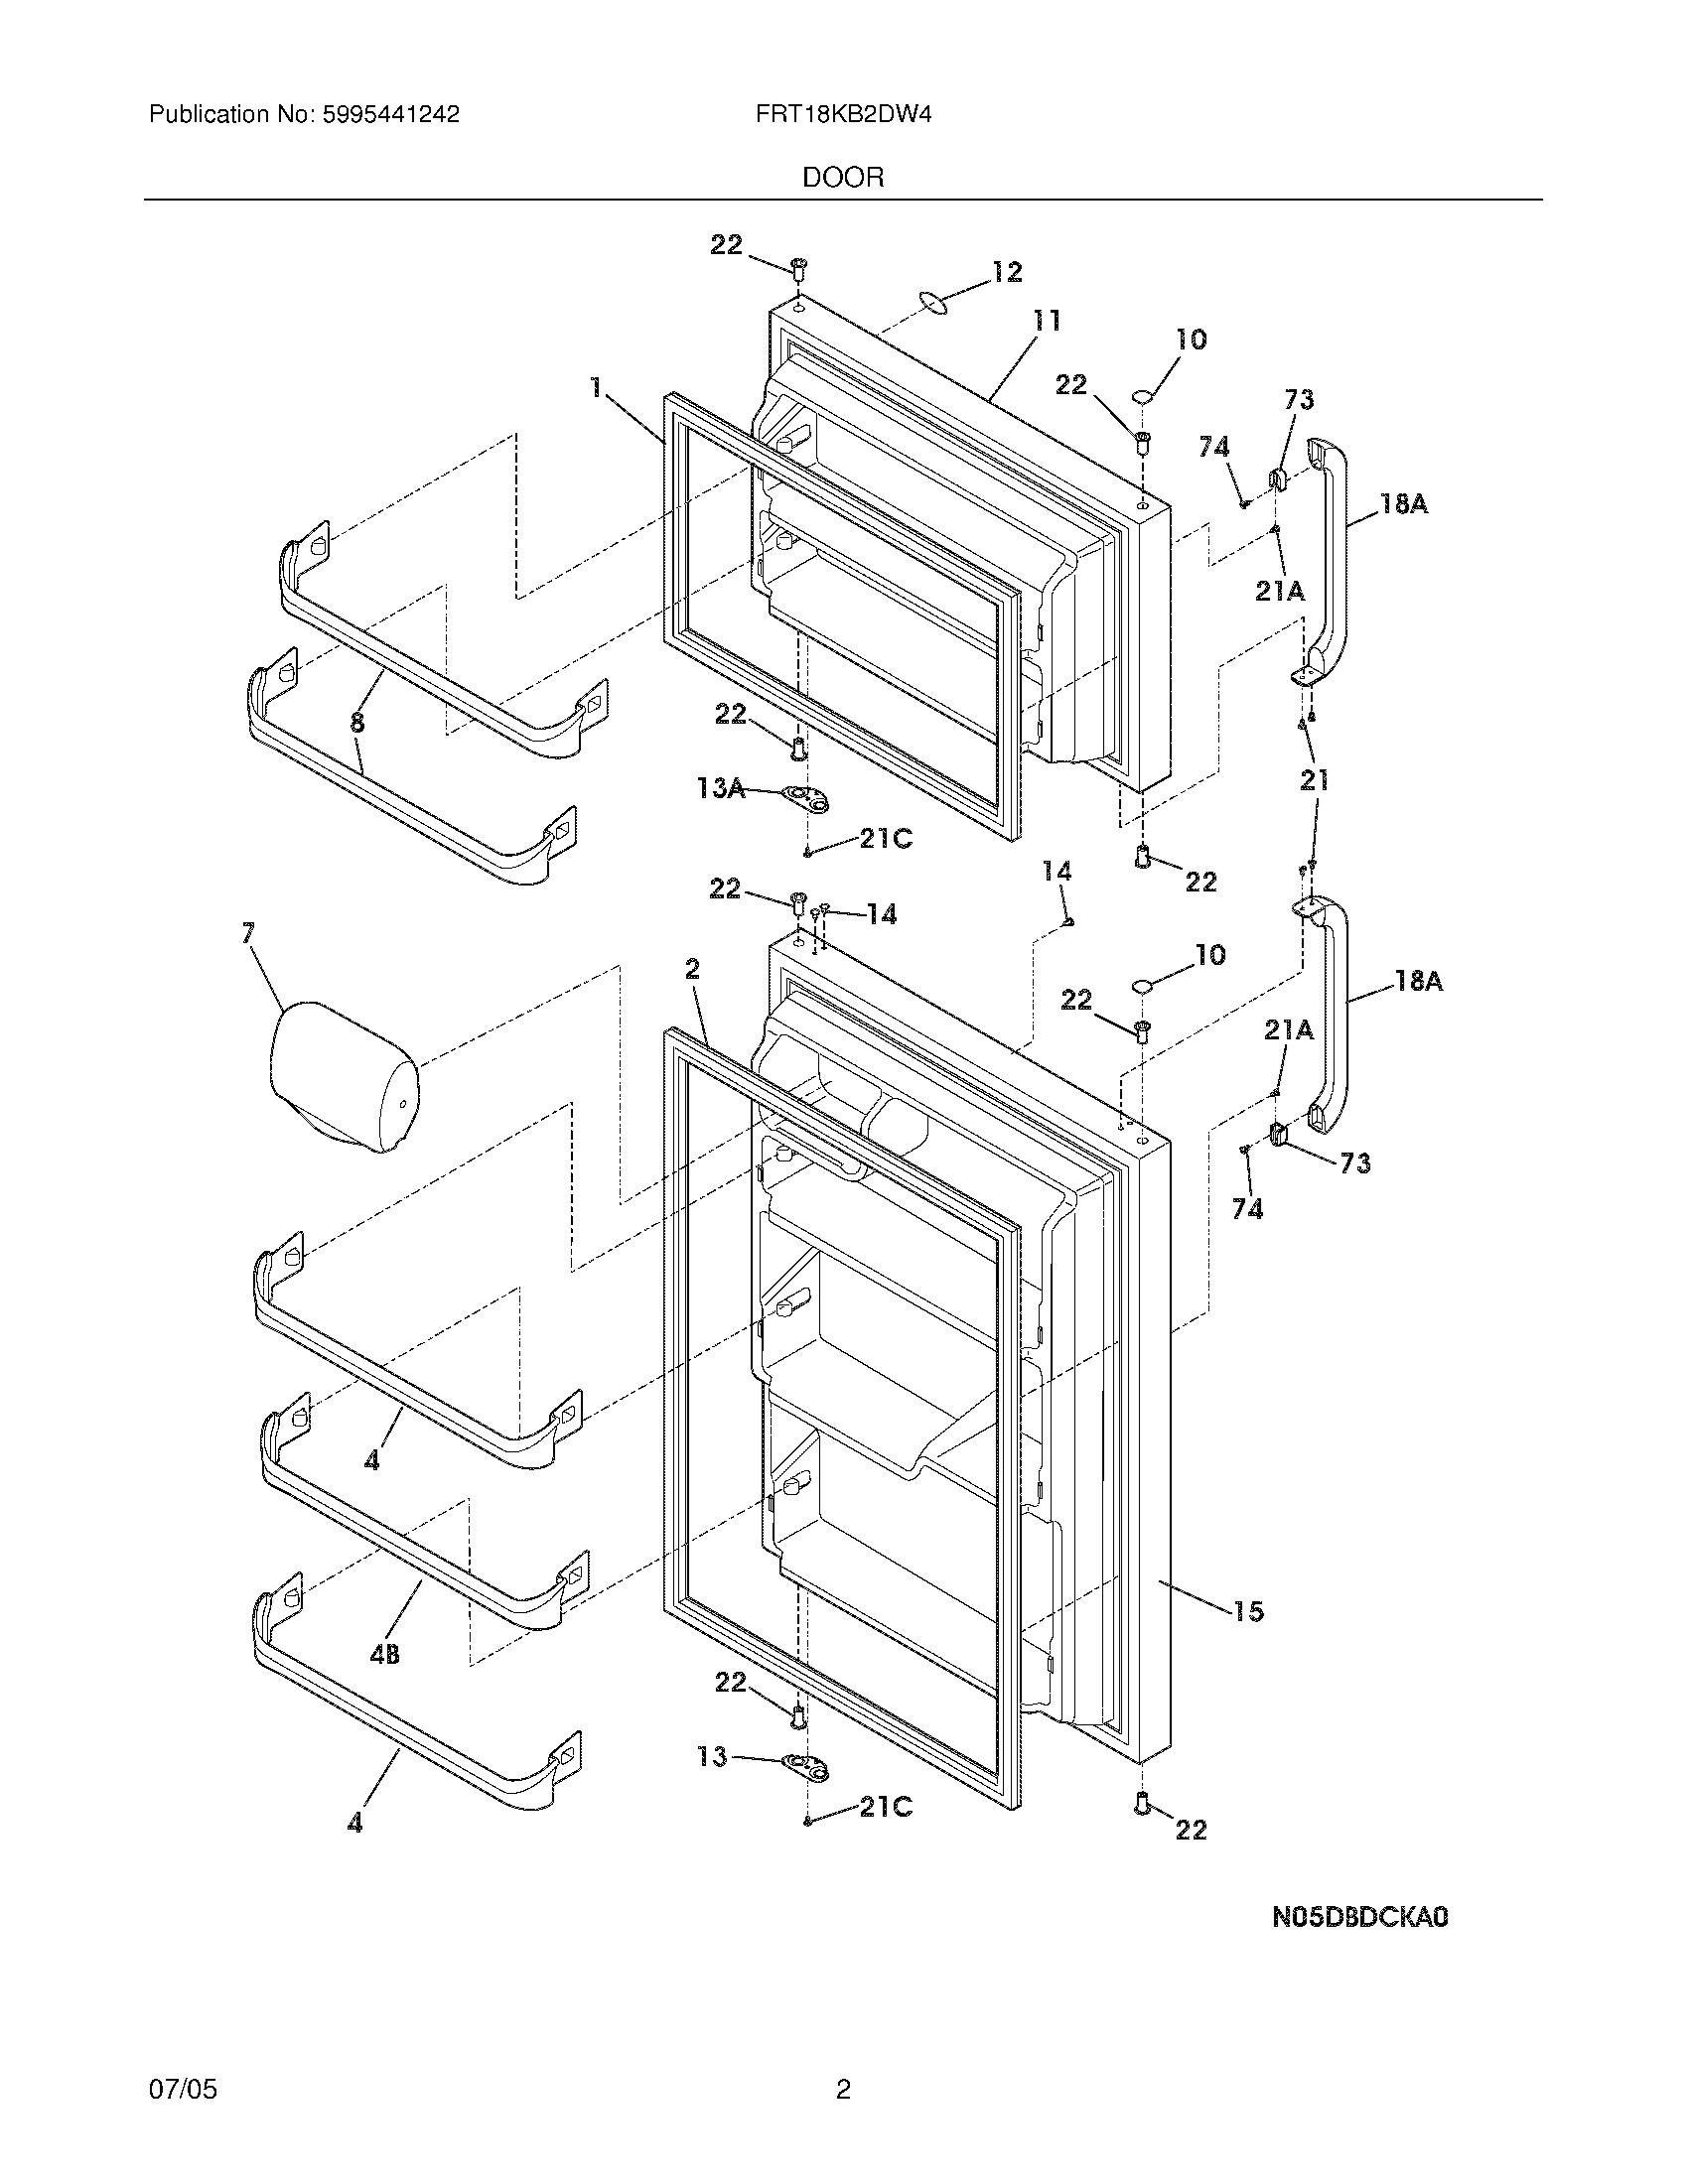 ElectroluxImg_19000101 20150717_00101766?width\\\\\\\\\\\\\\\\\\\\\\\\\\\\\\\=250 wiring diagram for smart car gandul 45 77 79 119 uc9050t wiring diagram at webbmarketing.co